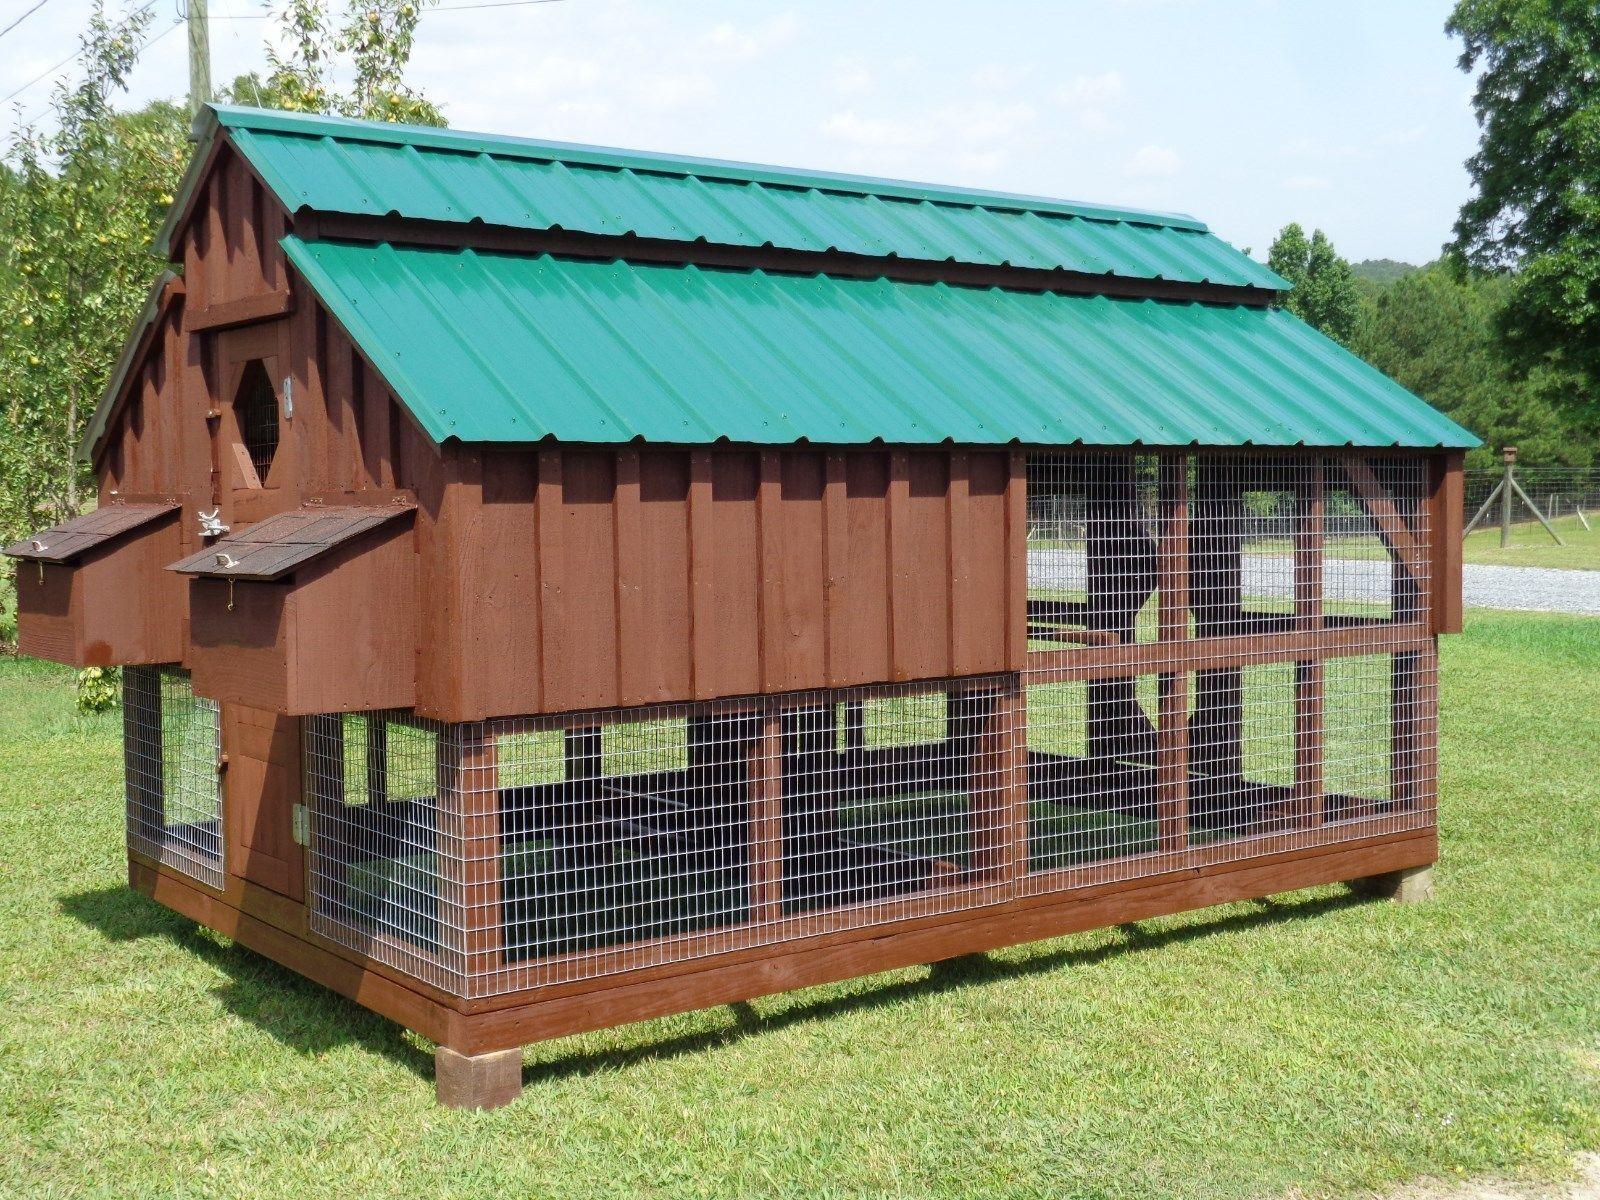 How to Build a Backyard Chicken Coop eBay